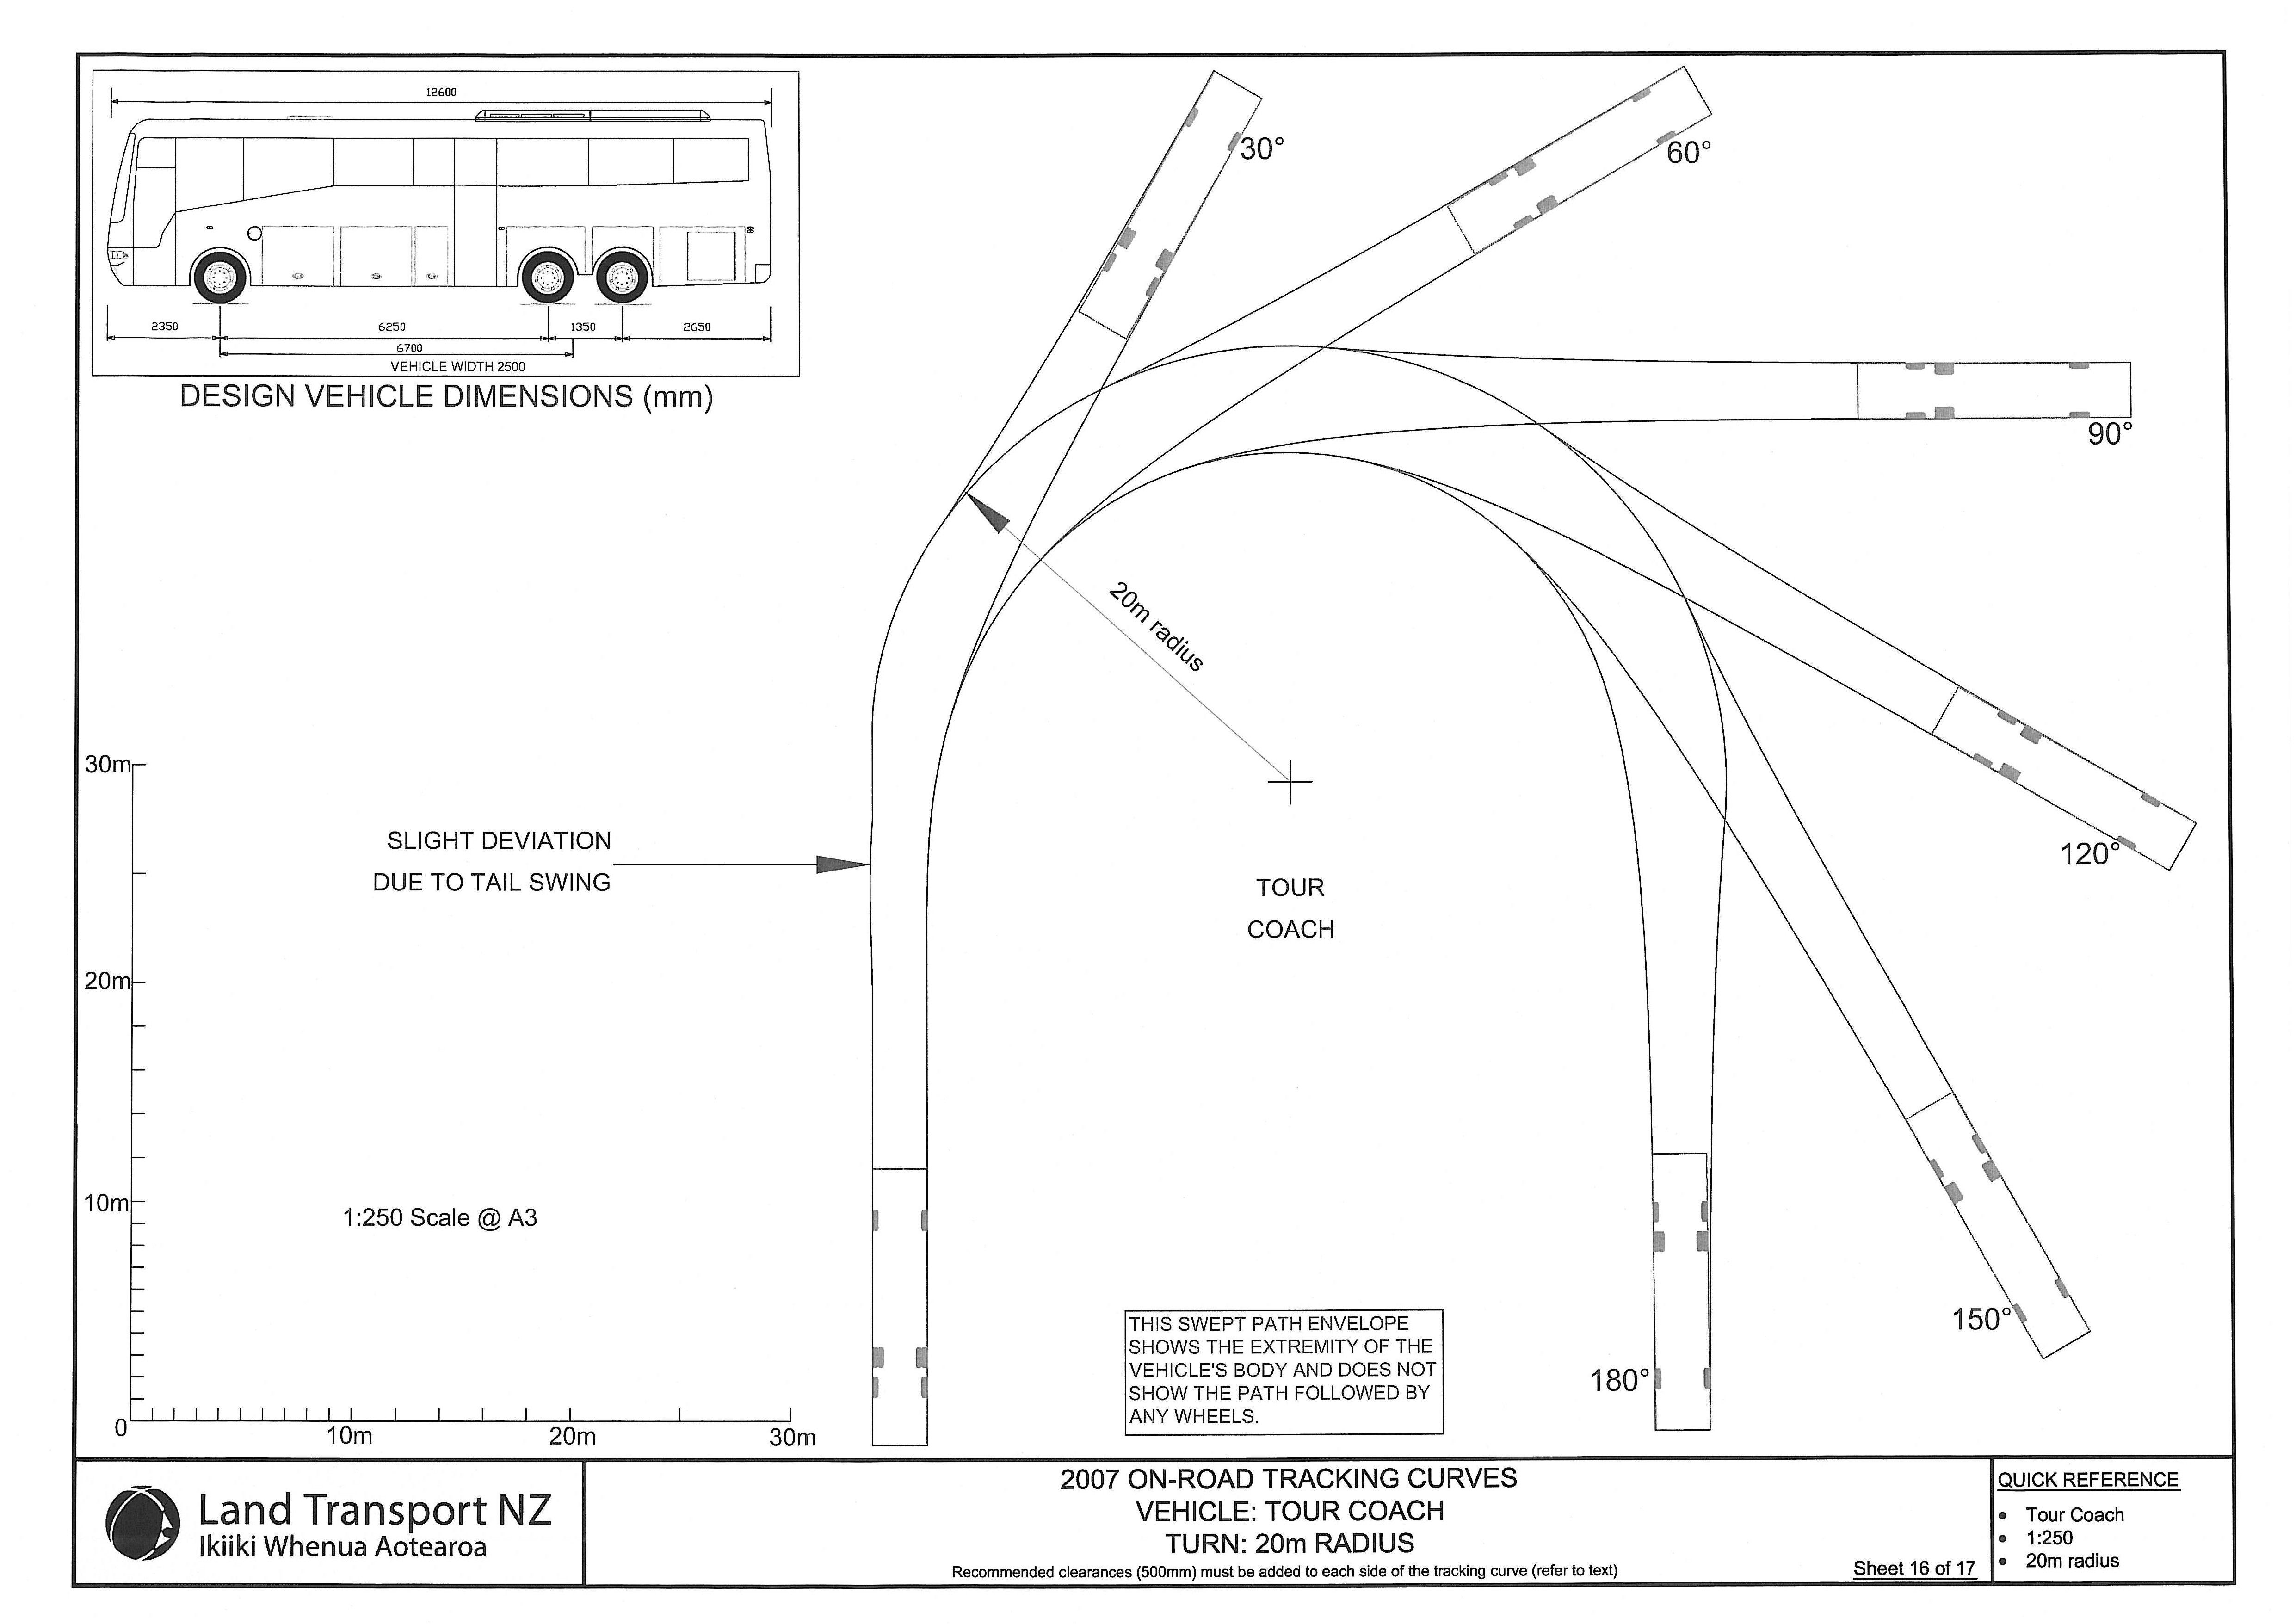 Ford f150 turning radius car reviews 2018 school bus turning radius templates car reviews 2018 maxwellsz